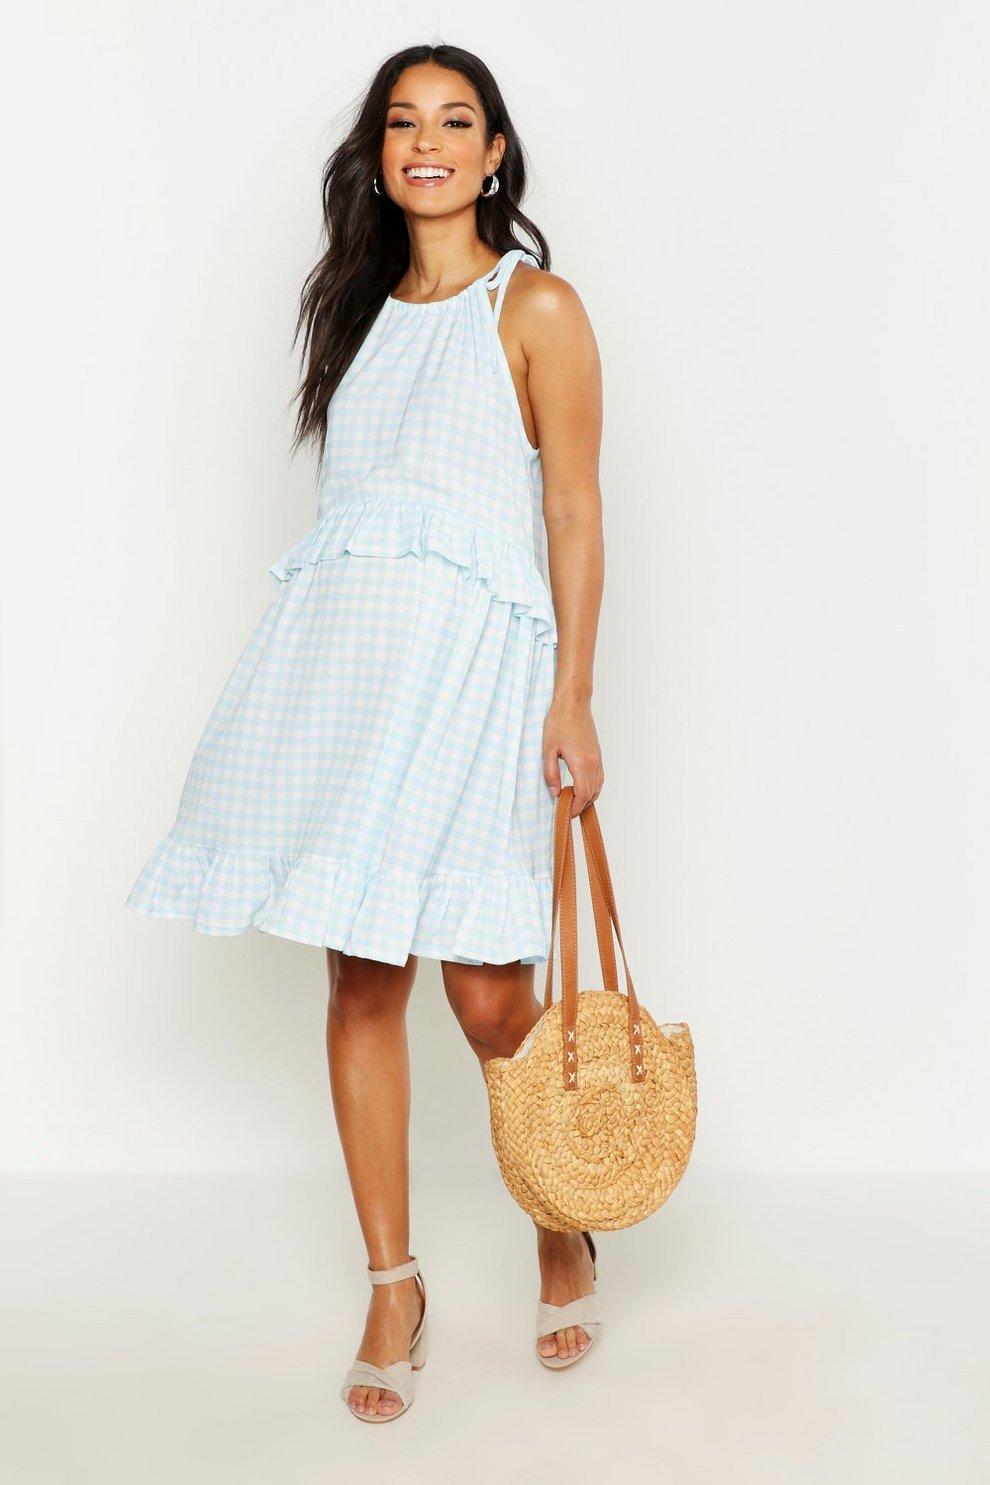 dba8dfaaf8e19 Womens Blue Maternity Gingham Ruffle Swing Dress